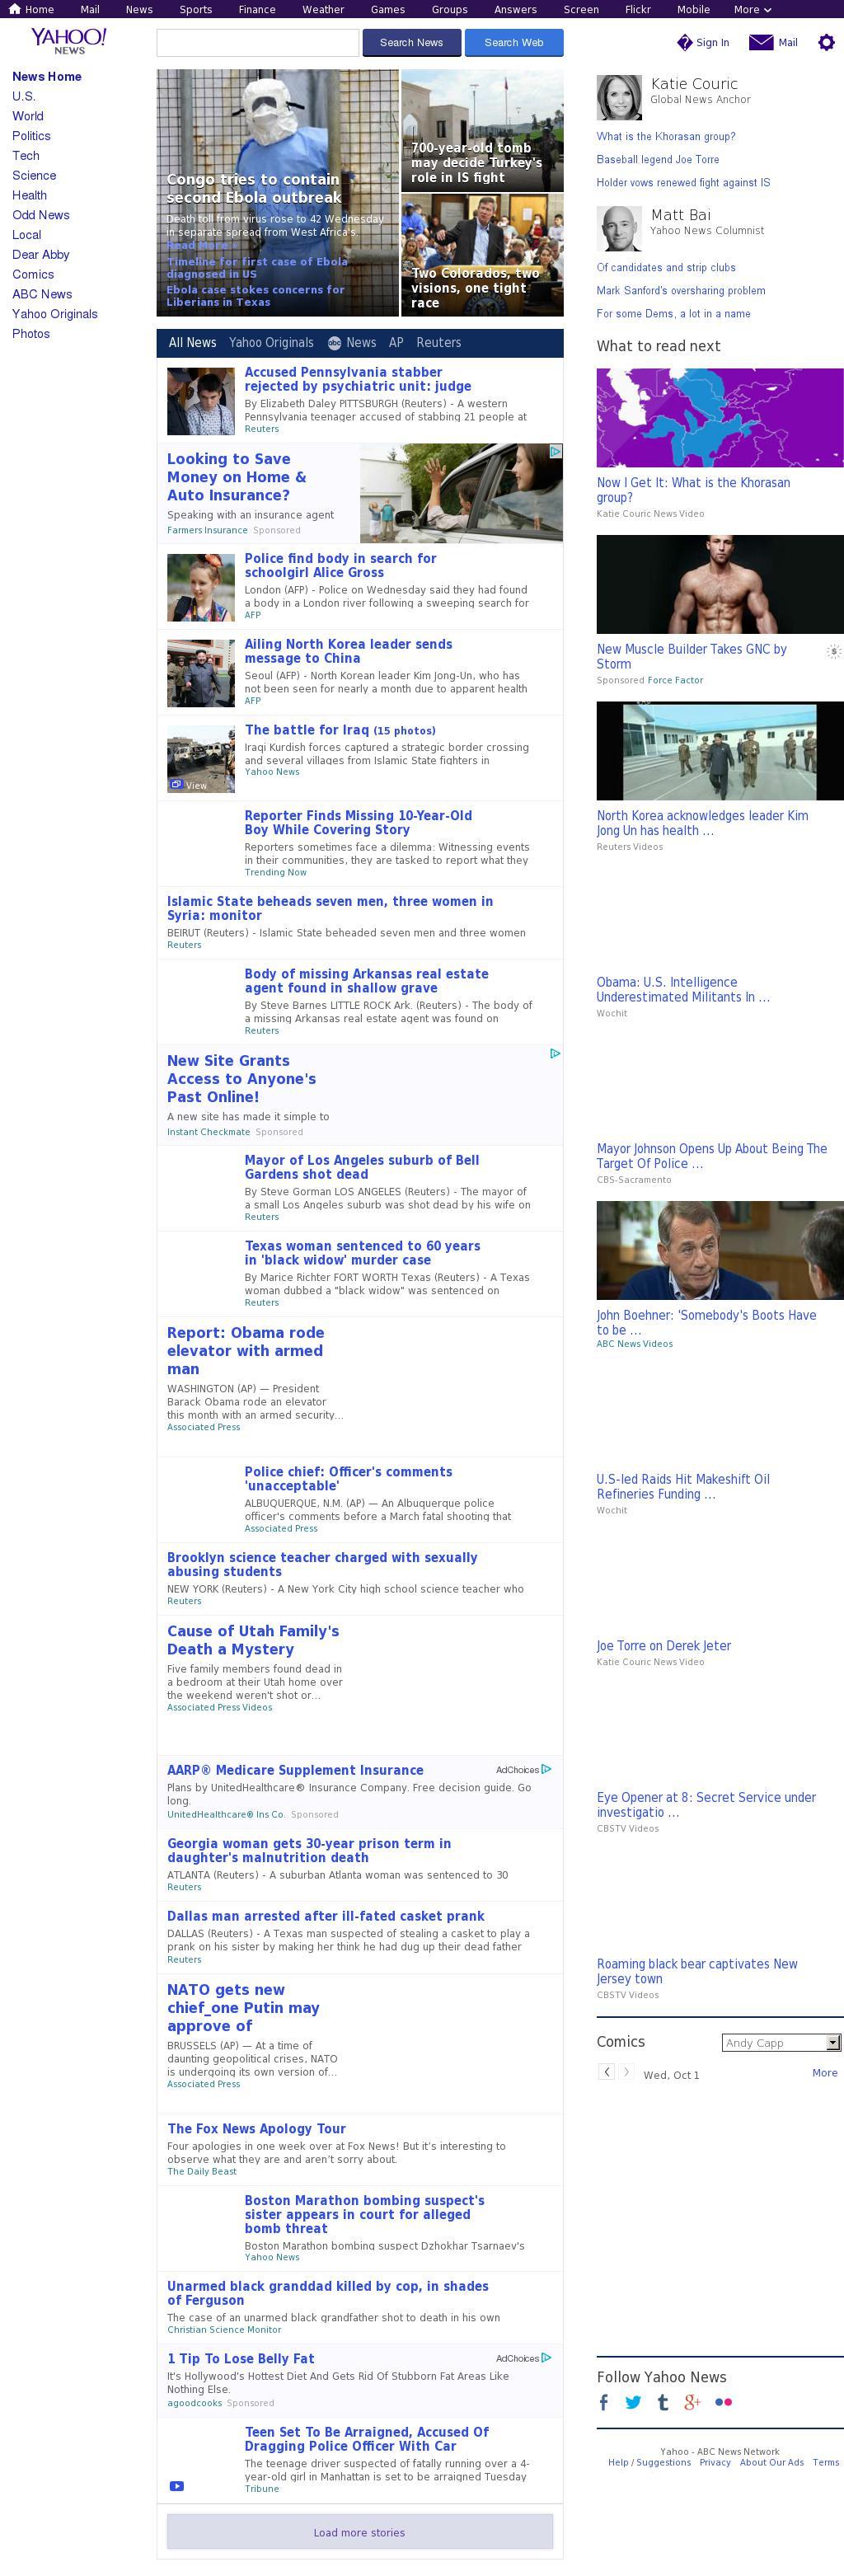 Yahoo! News at Wednesday Oct. 1, 2014, 1:20 p.m. UTC